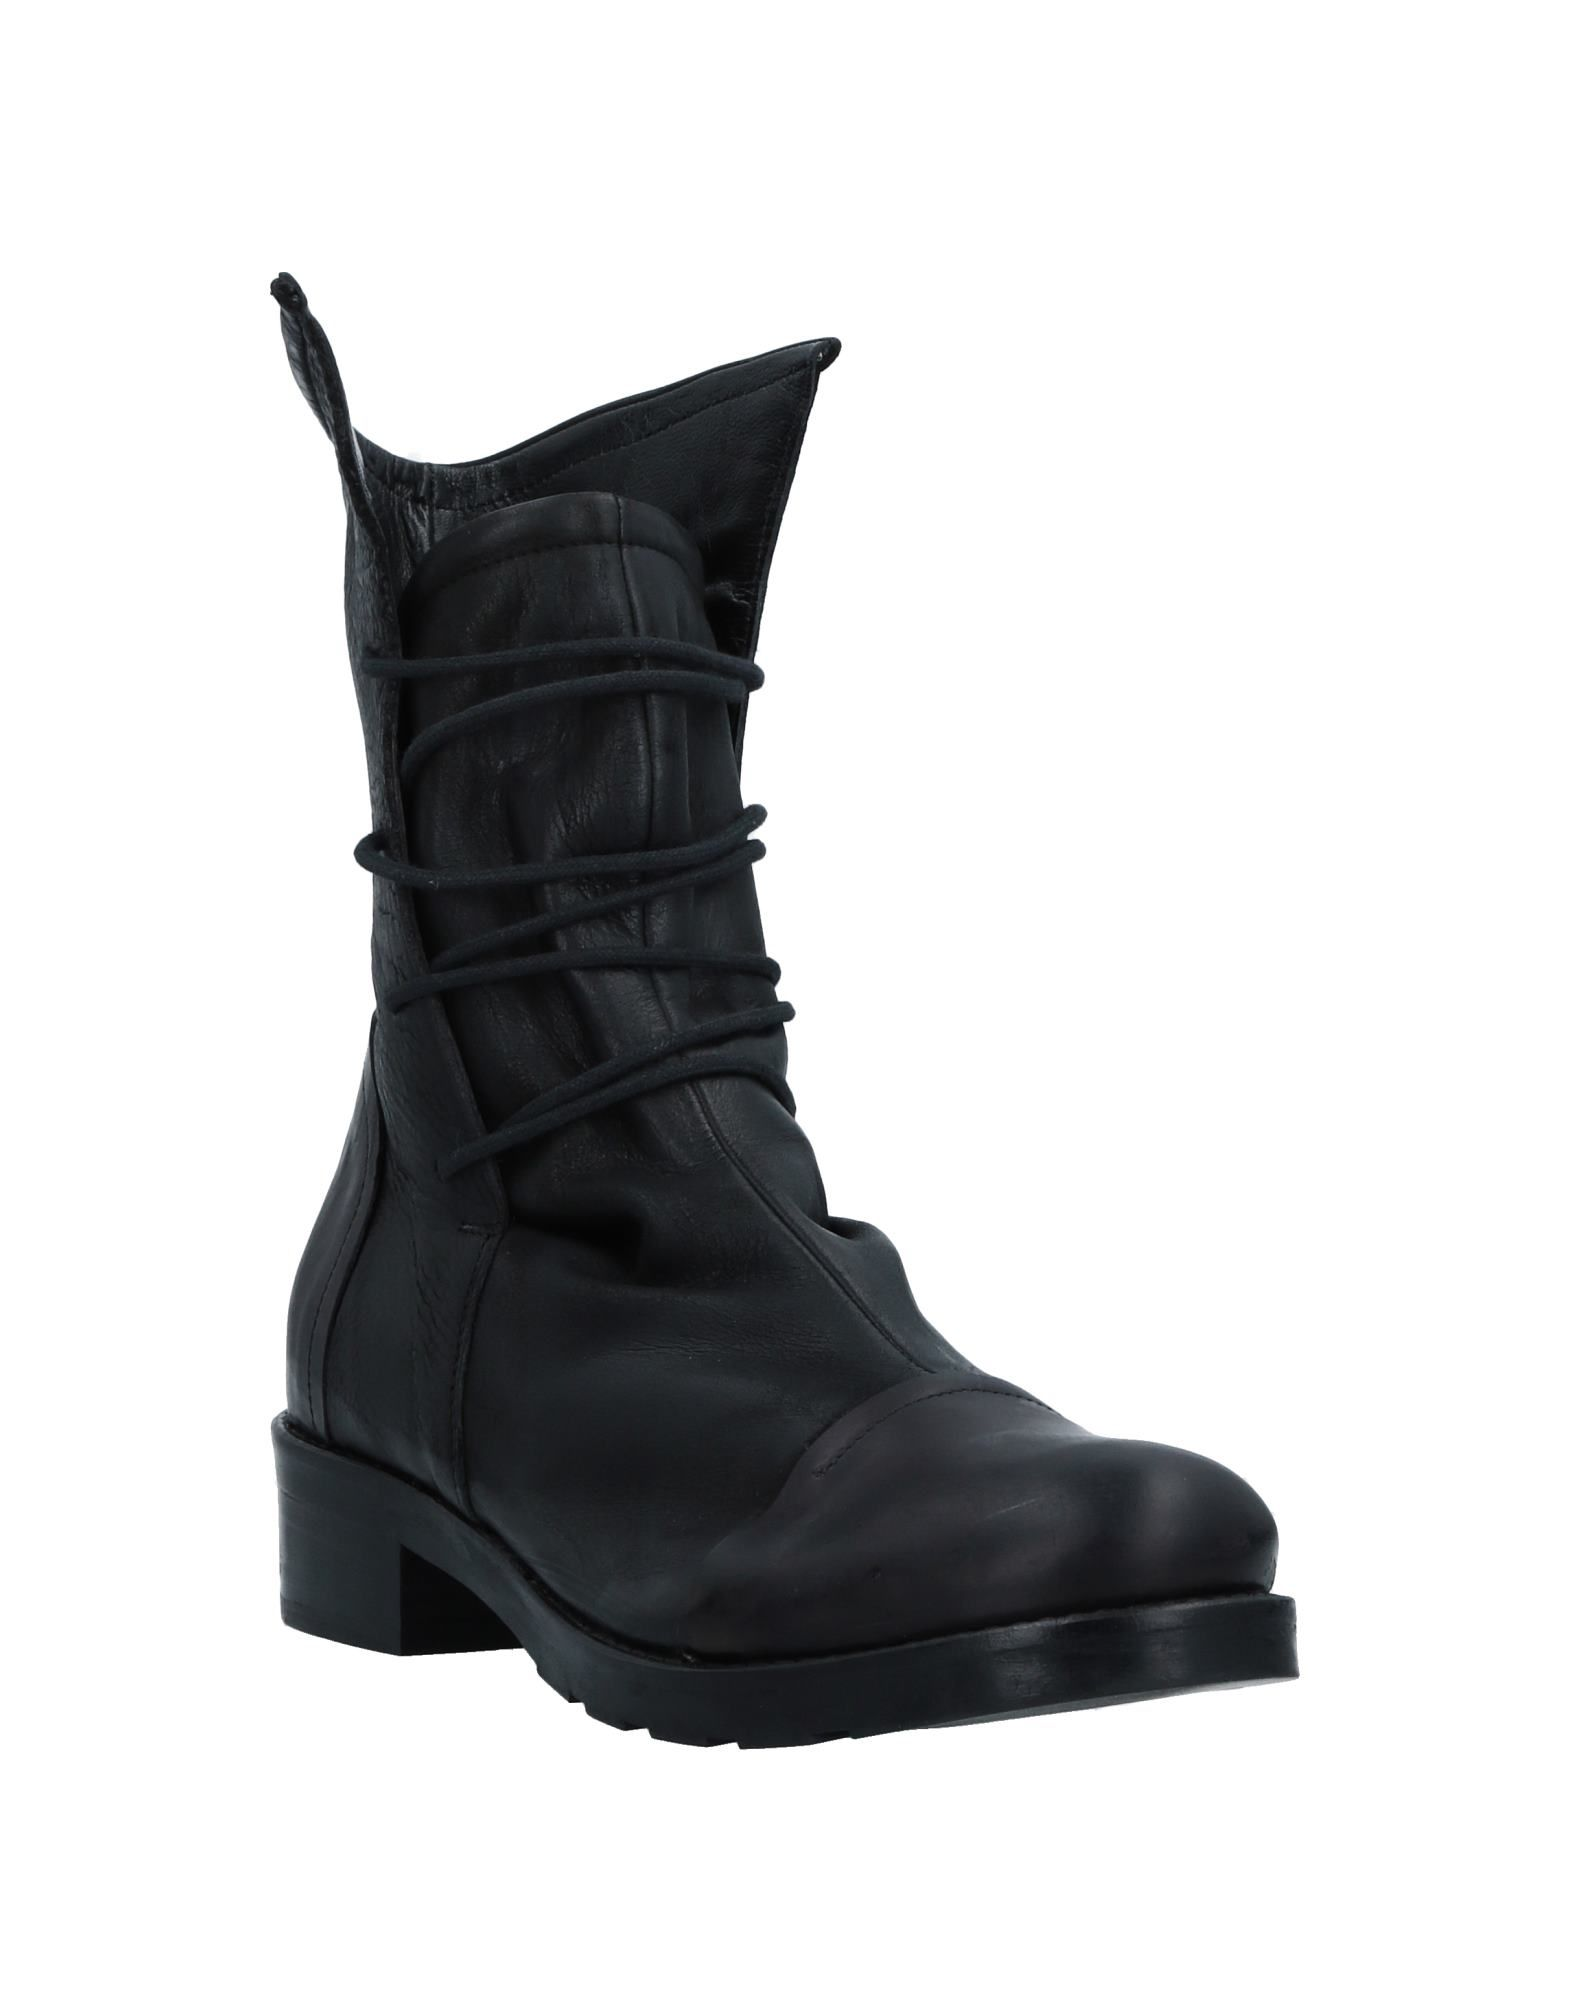 Stilvolle billige  Schuhe Kobra Stiefelette Damen  billige 11519039FC 4eca97